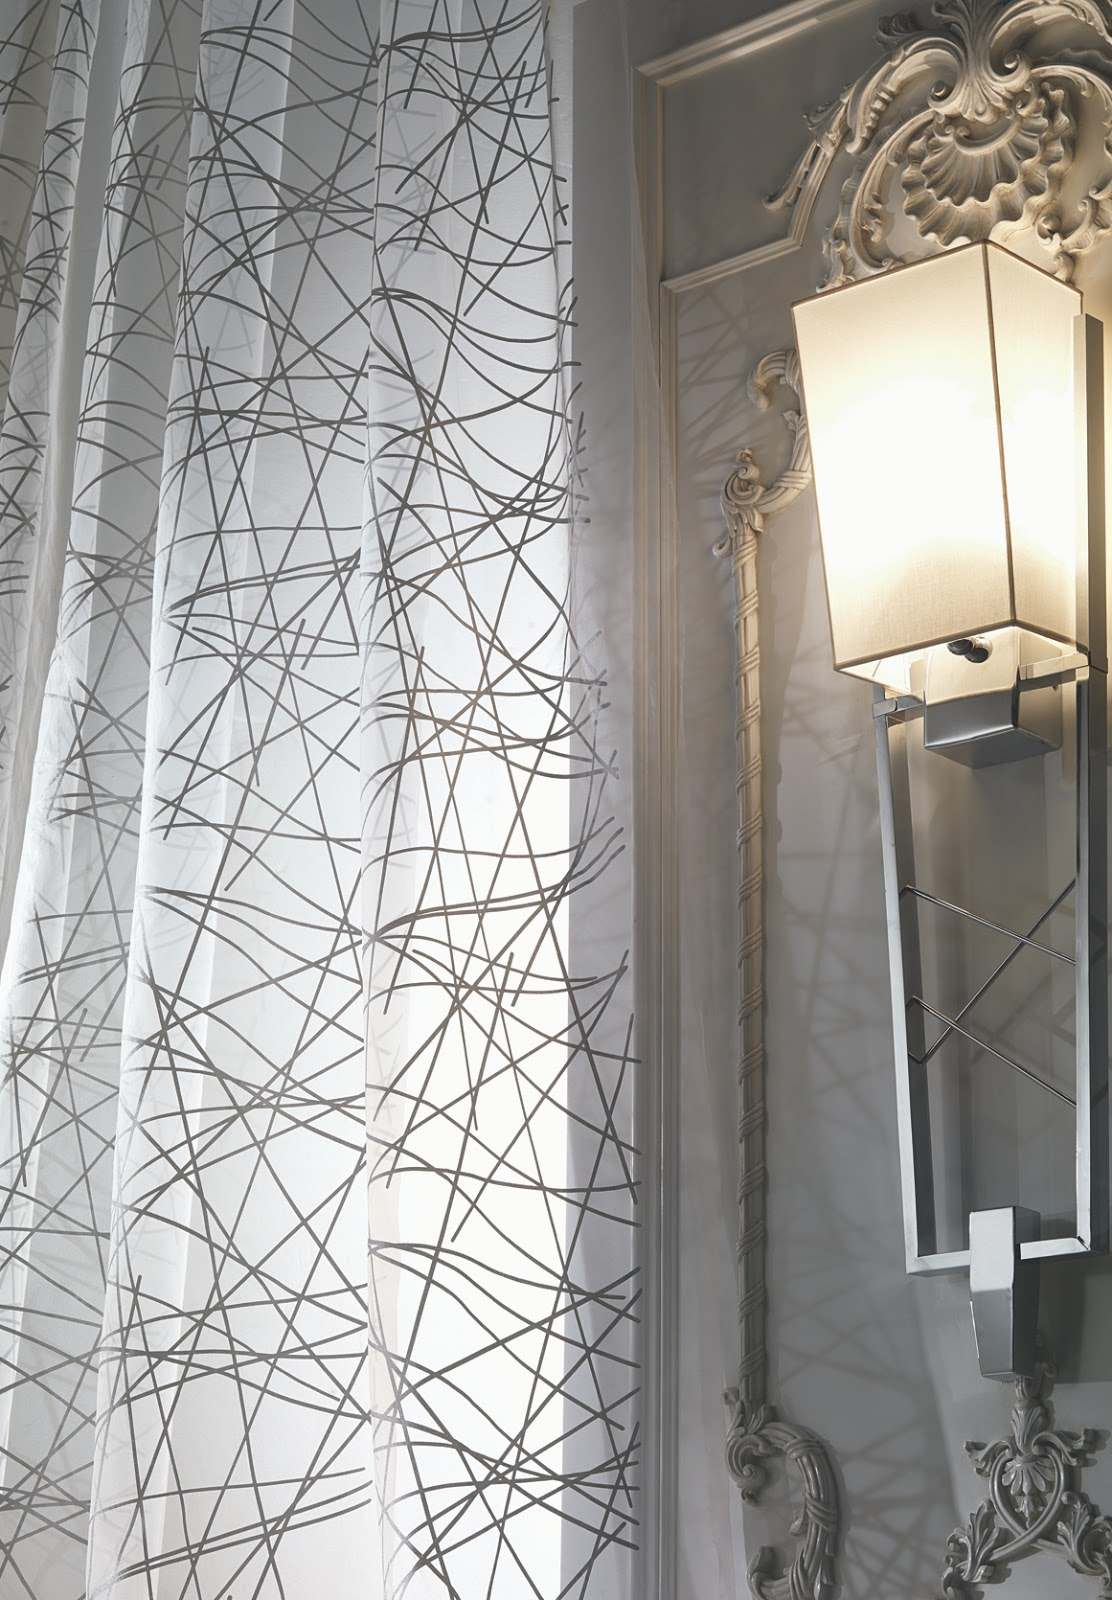 Tende da interni moderne immagini for Tende moderne per interni on line